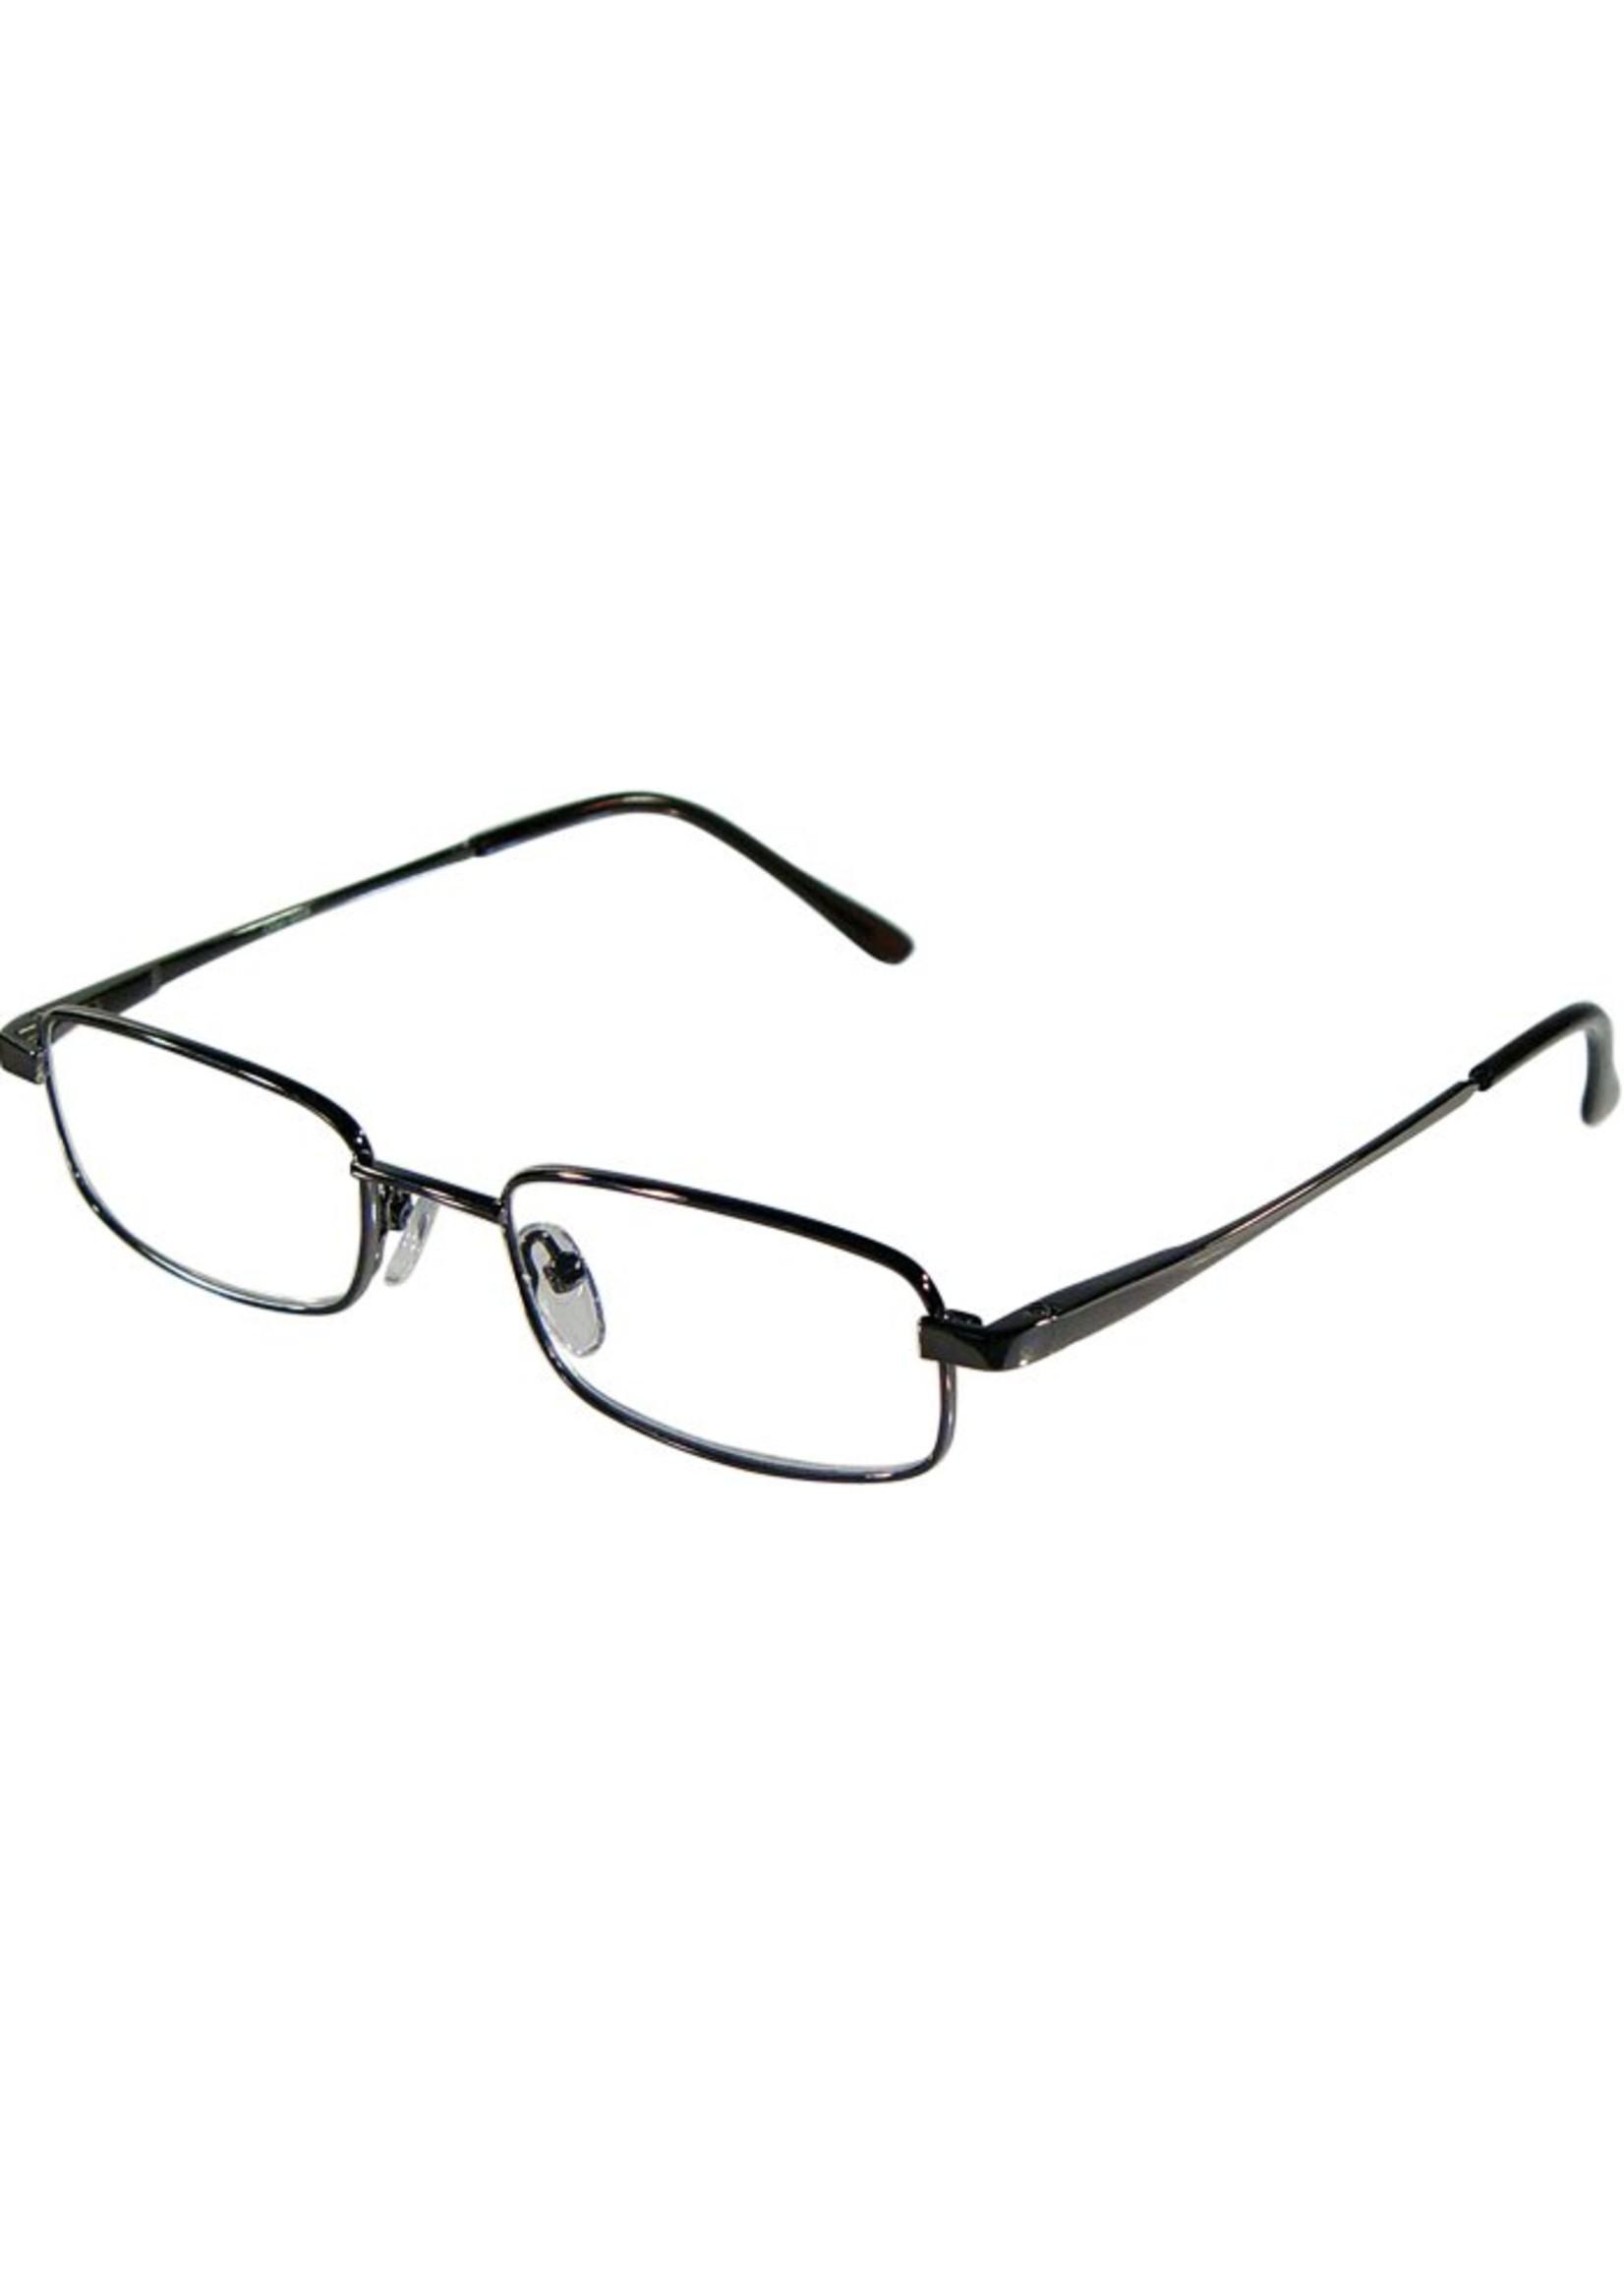 Basic Leesbril LEO 115  in Gun metaal met flexibele veren